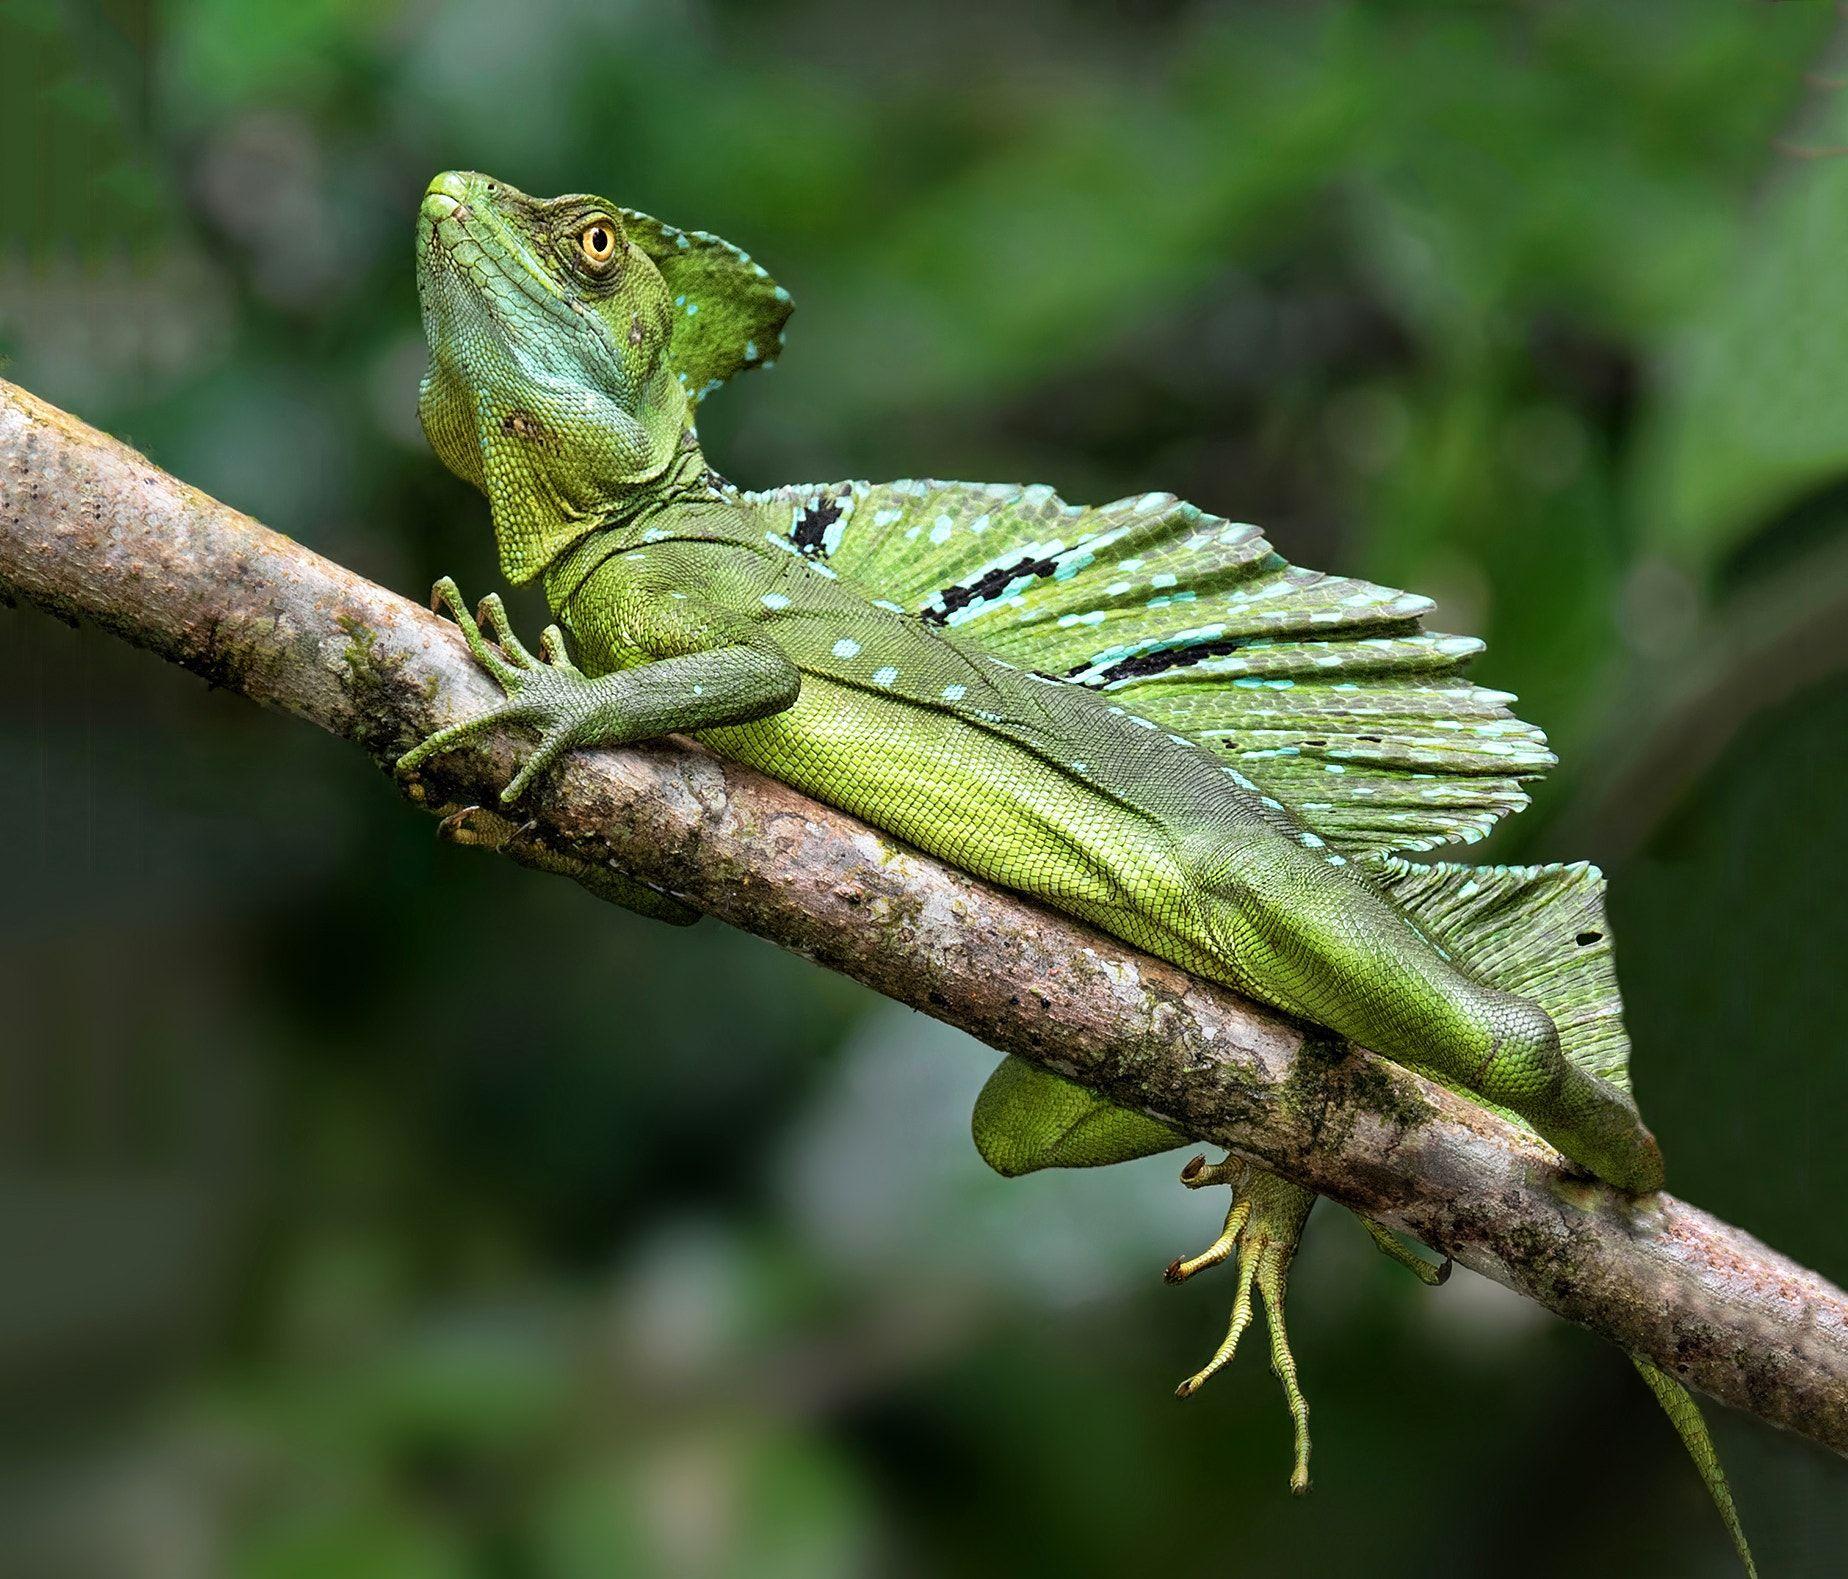 Green Basilisk Lizard #2 - This was another green basilisk ...